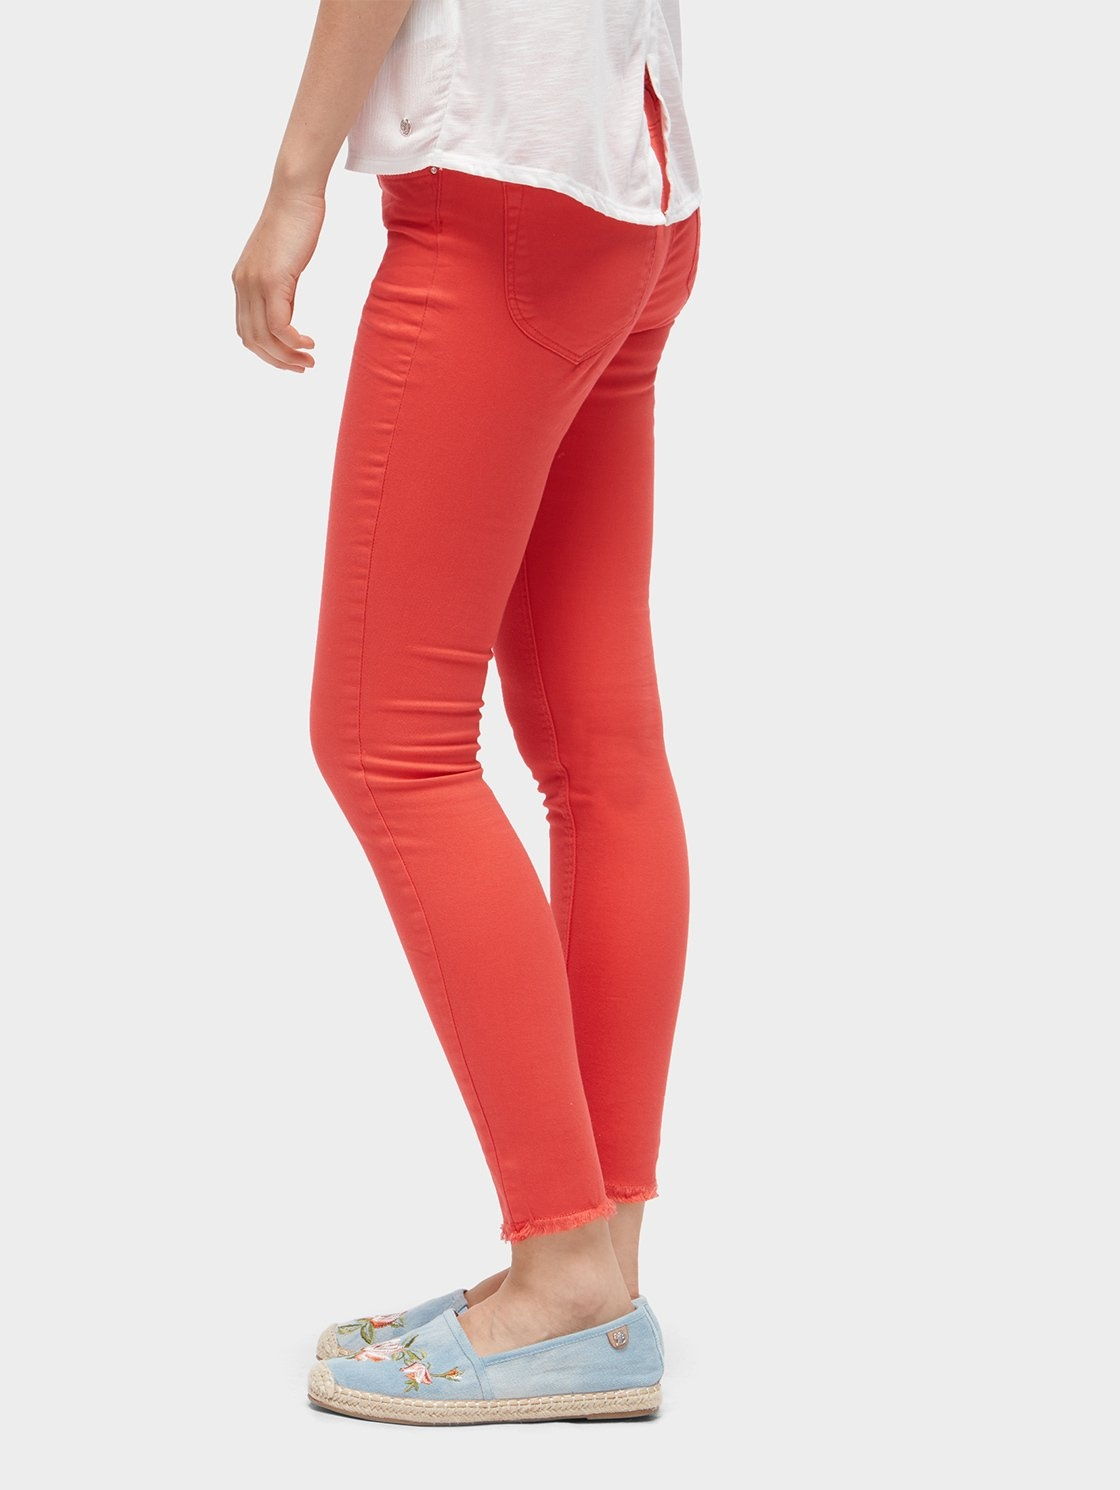 8 Skinny Online Kopen Tom Ankle broeknela Denim 7 Extra Tailor Broek JK1clF3T